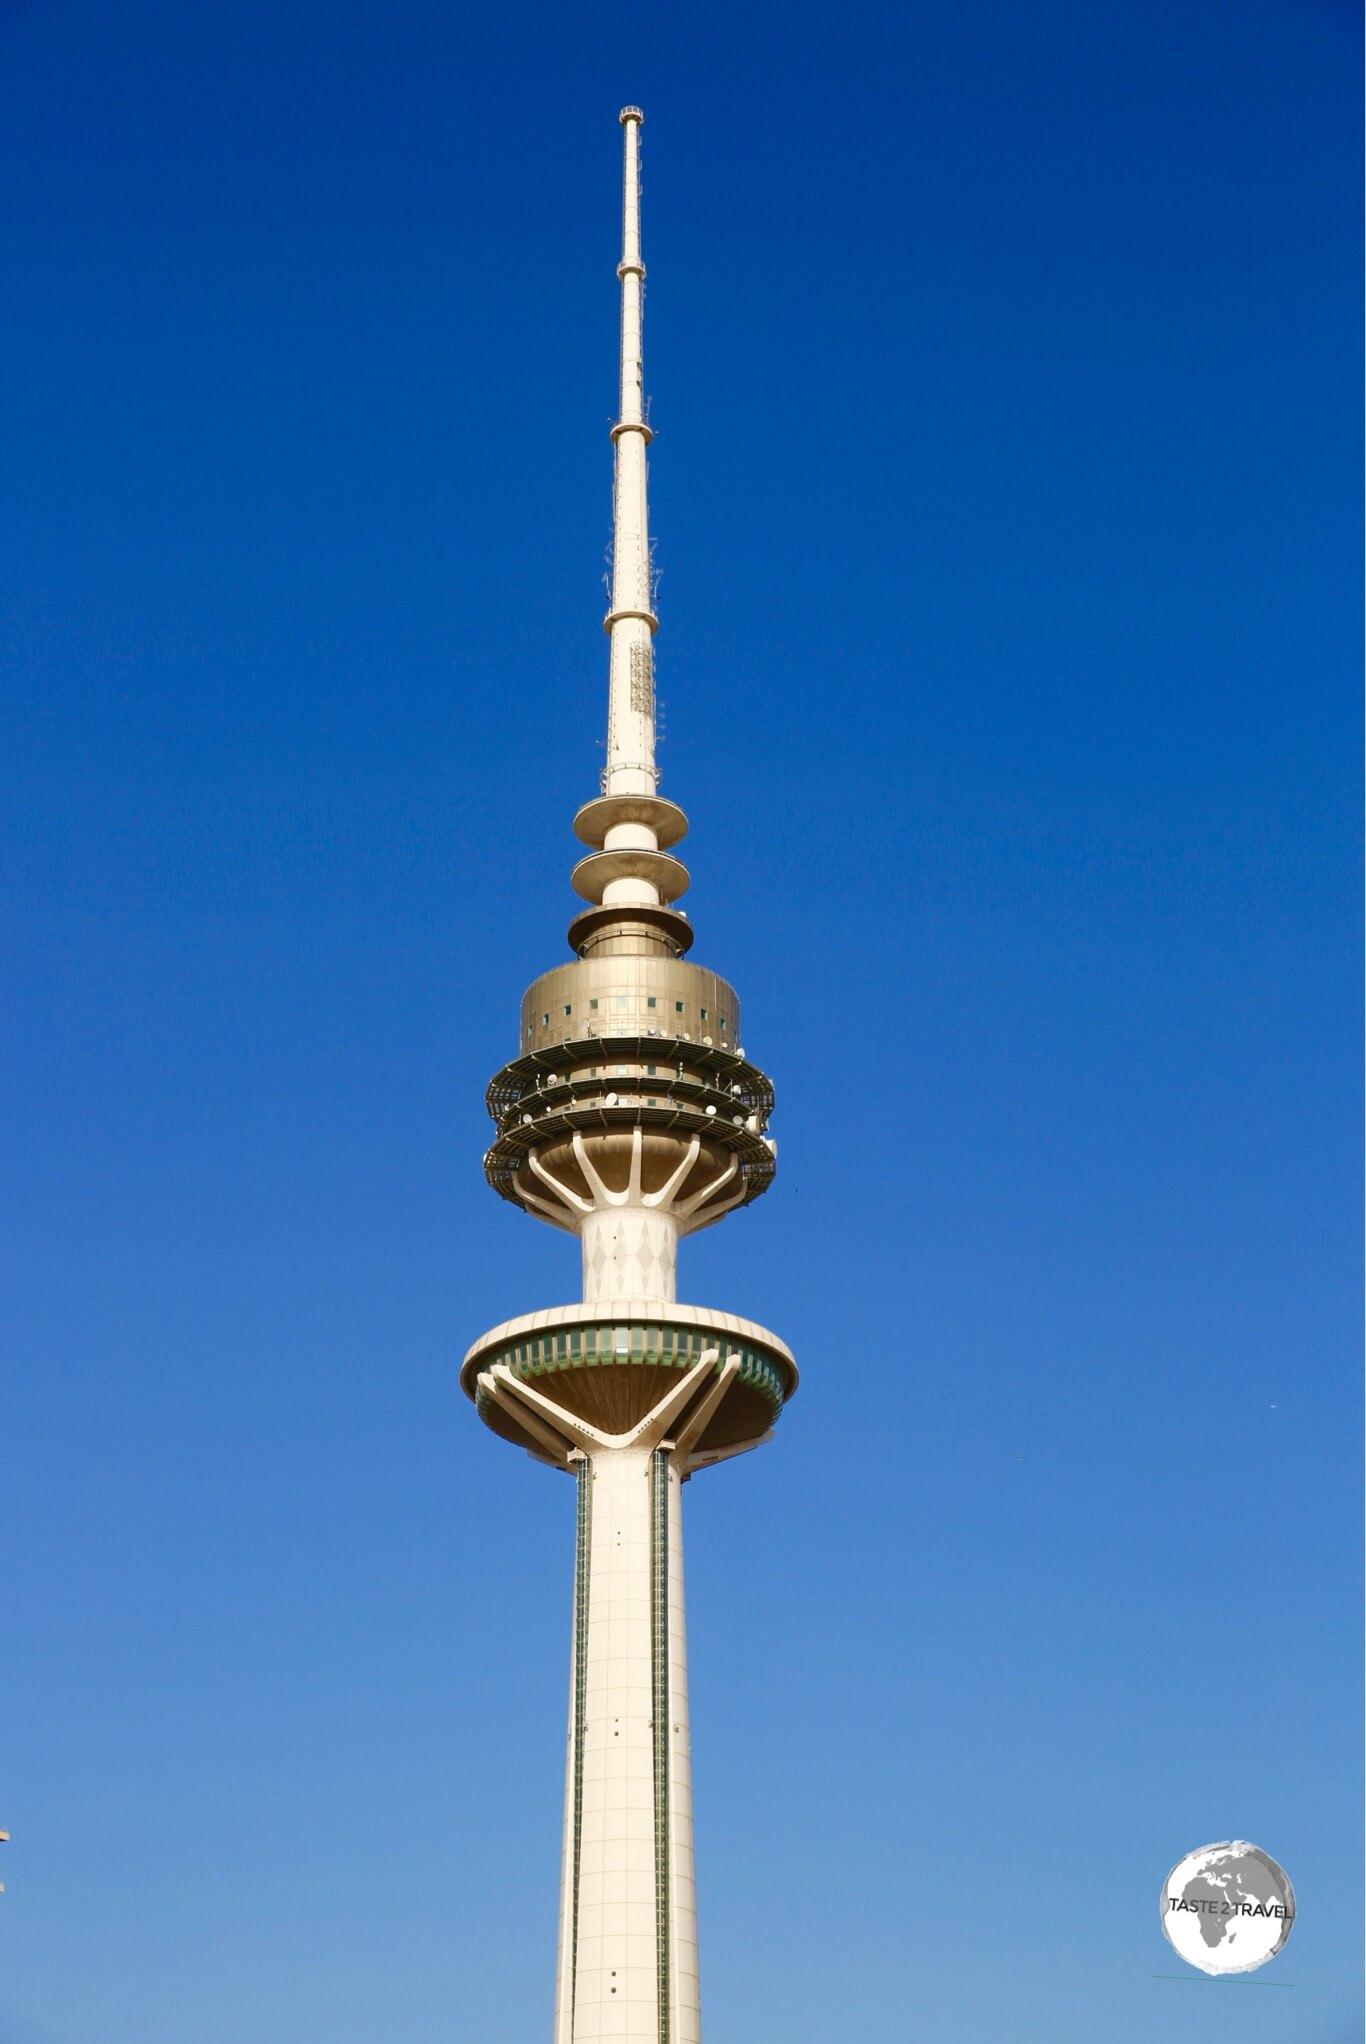 Liberation tower dominates the skyline of Kuwait City.